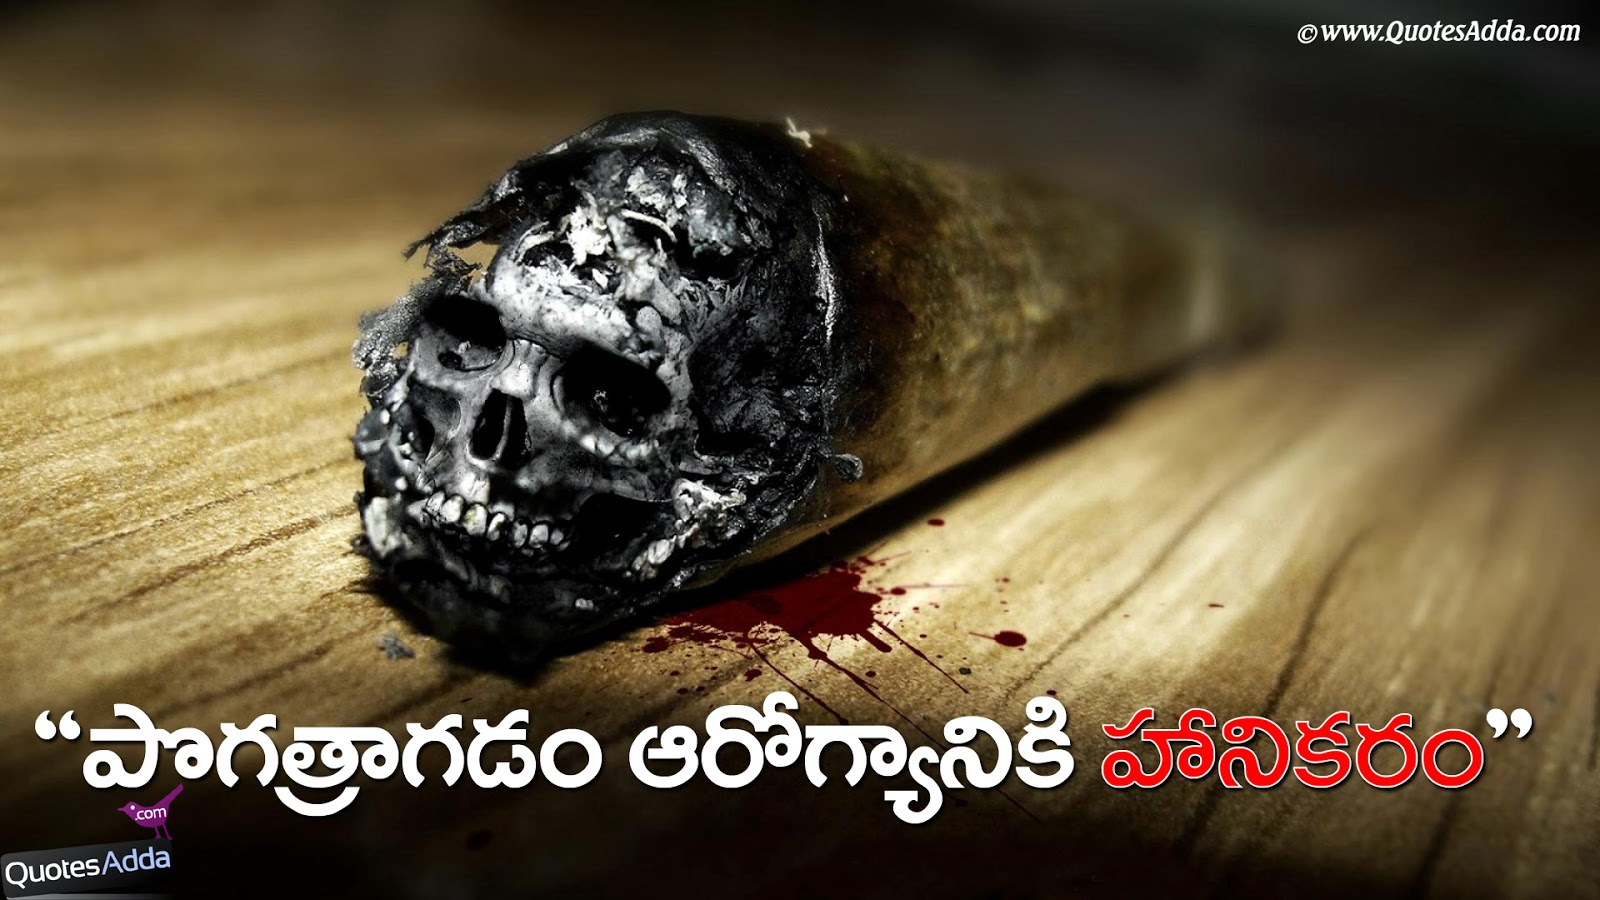 No Smoking Telugu Wallpapers Quotes Addacom Telugu Quotes Tamil 1600x900